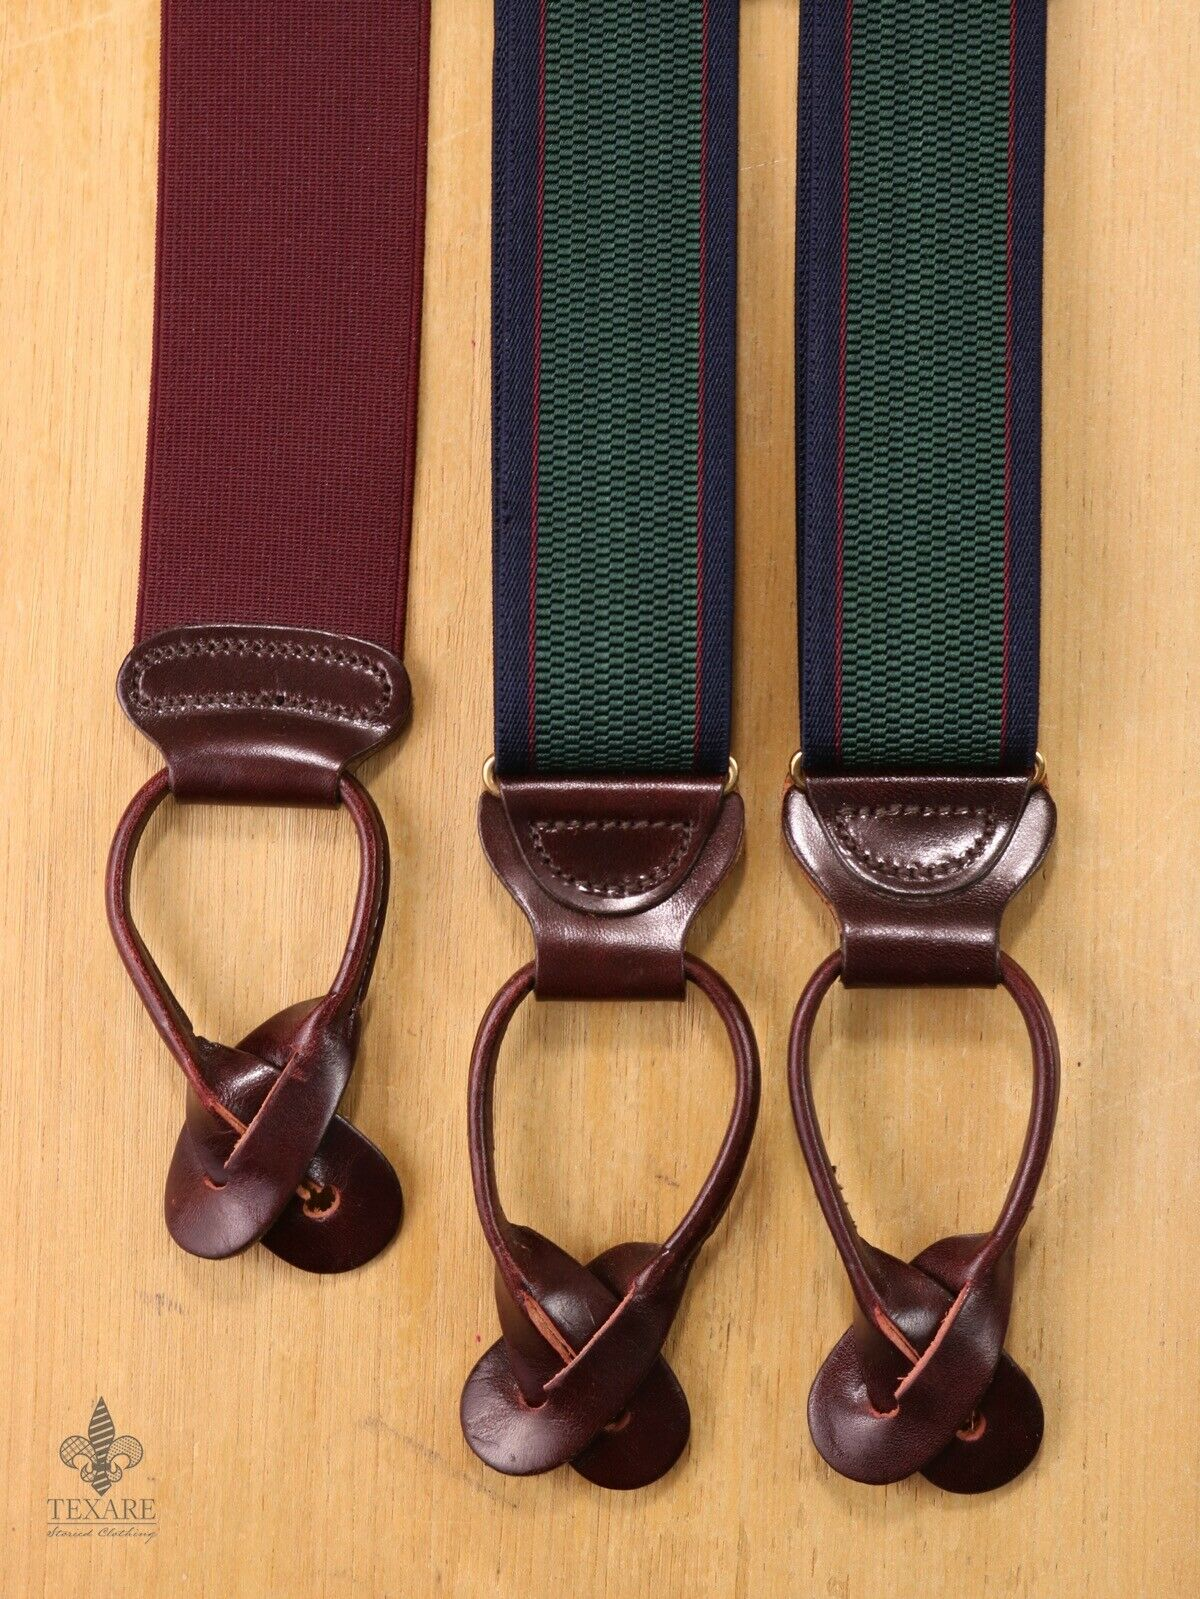 TRAFALGAR British Racing Green Striped Stretch Braces Suspenders EH02